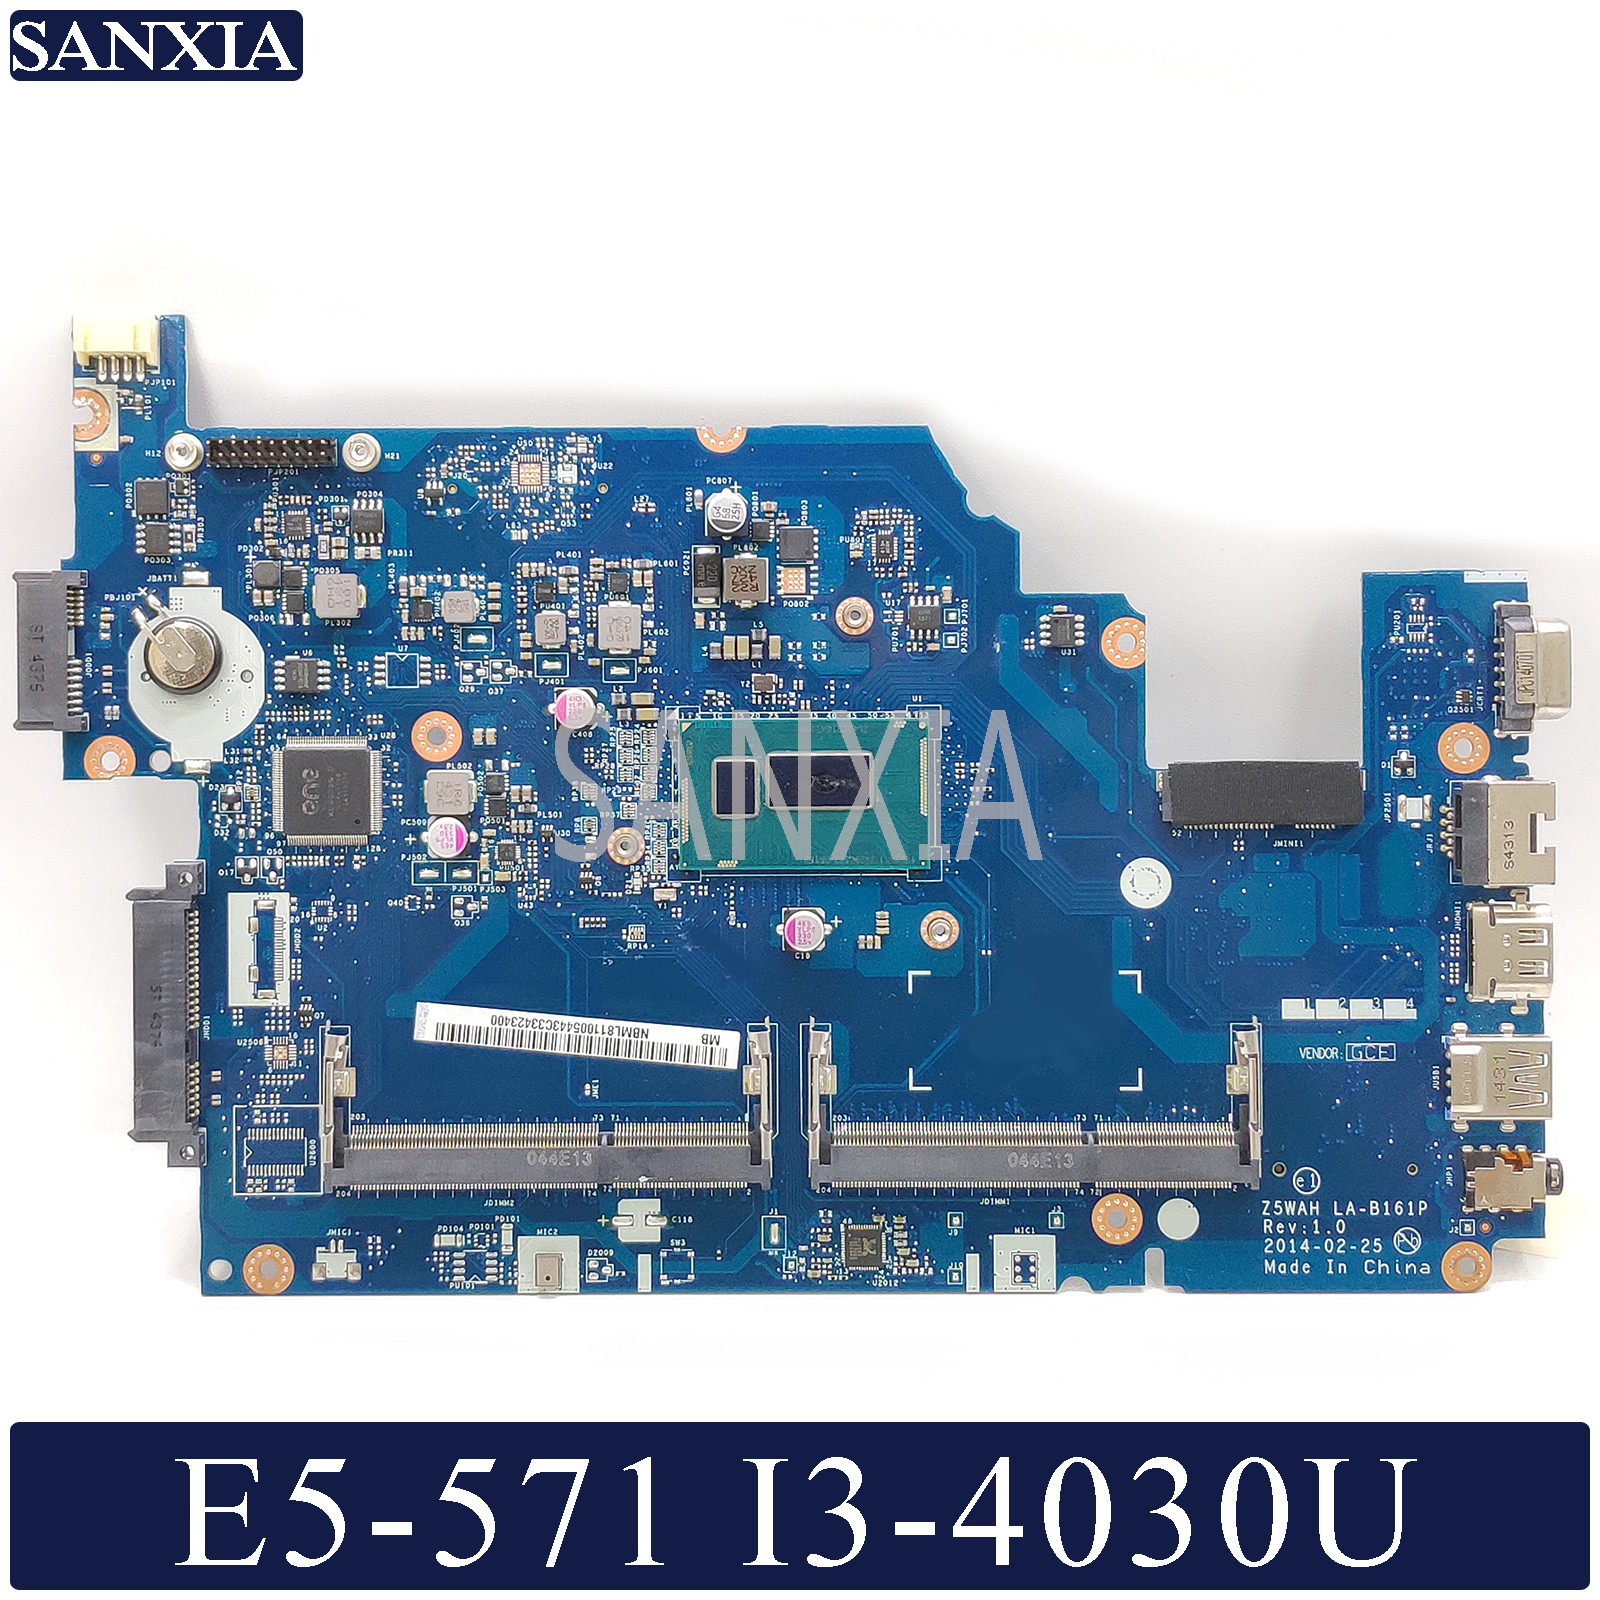 KEFU LA-B161P Laptop motherboard para Acer E5-571 E5-571P mainboard original I3-4030U/4010U